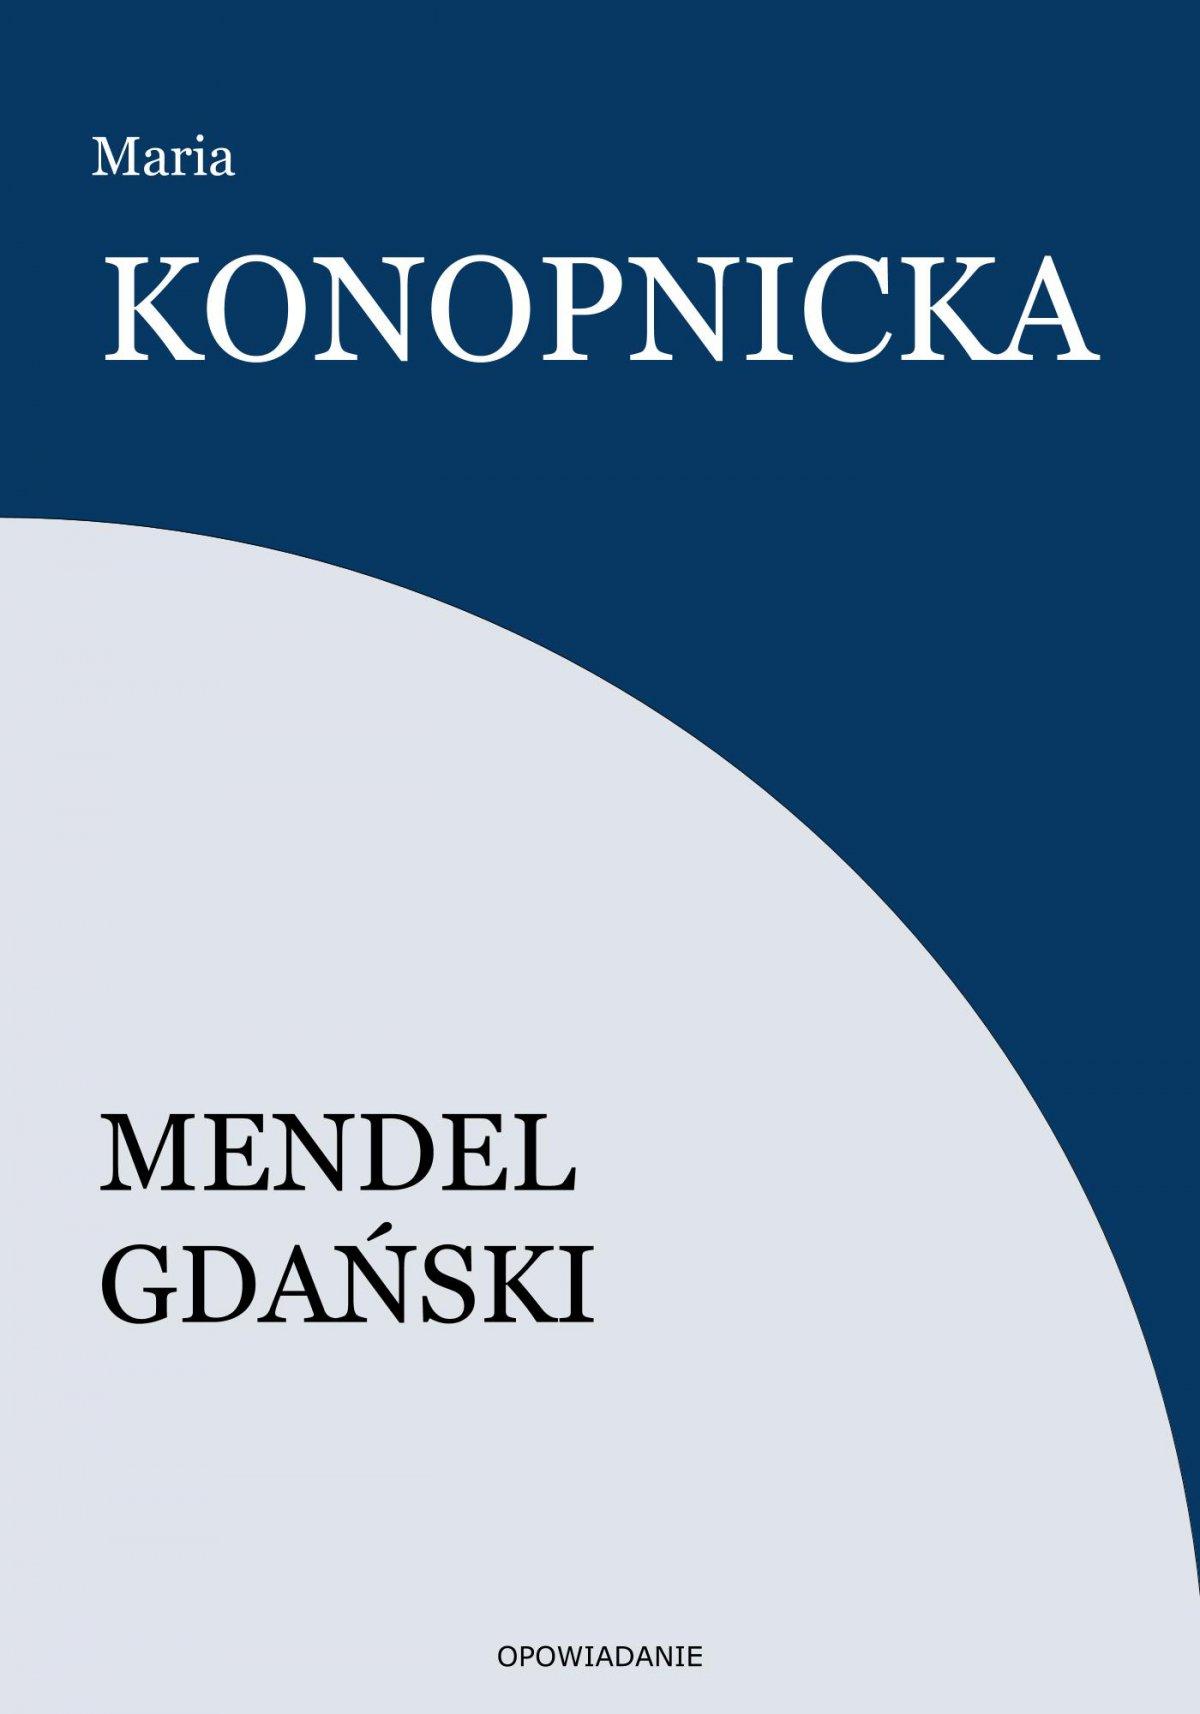 Mendel Gdański - Ebook (Książka na Kindle) do pobrania w formacie MOBI